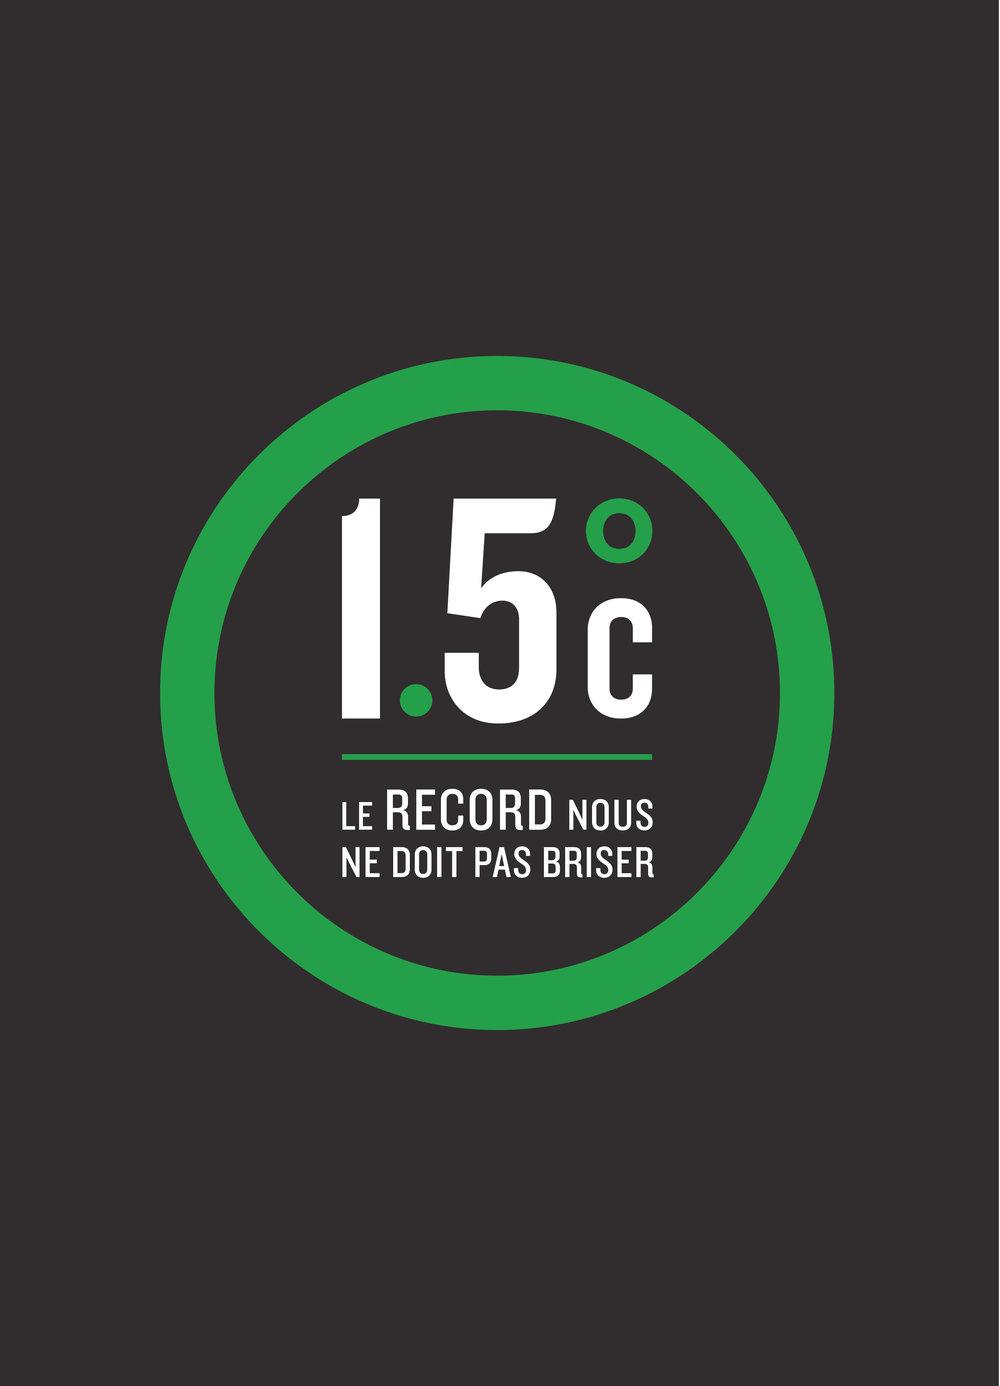 1.5C_A4_CircleLogo_French.jpg